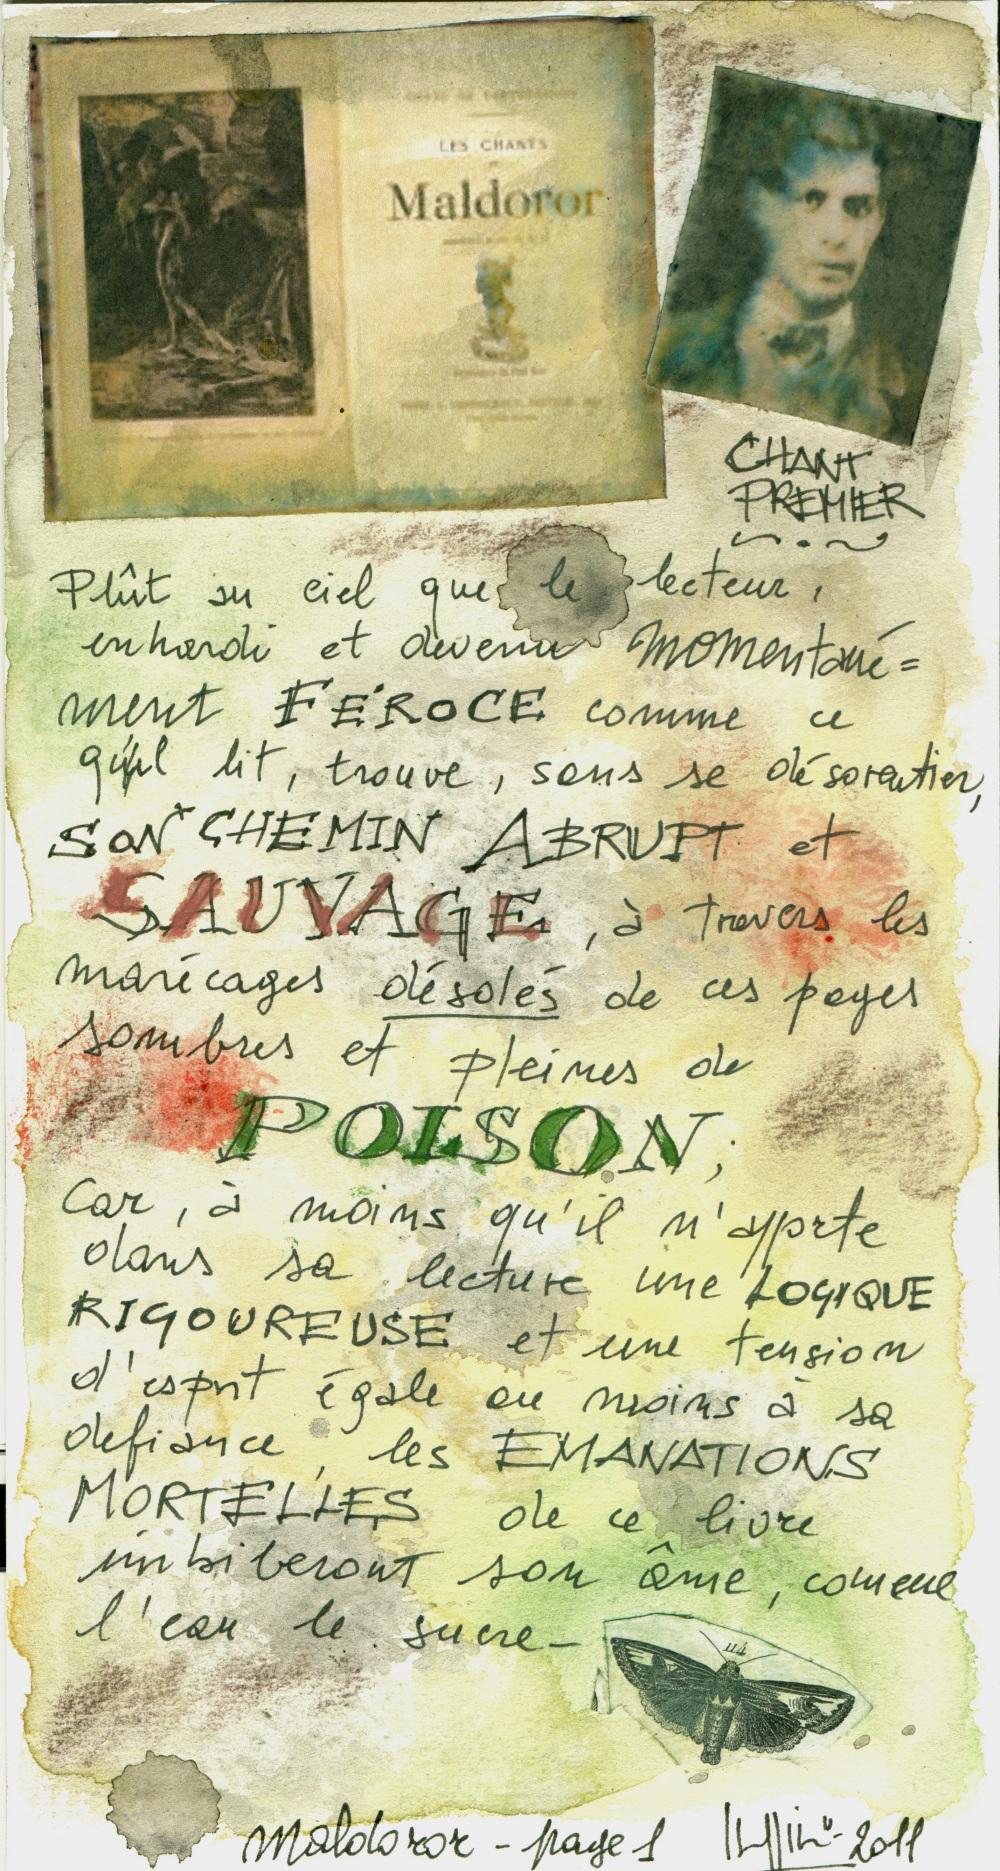 MALDOROR PAGE 1